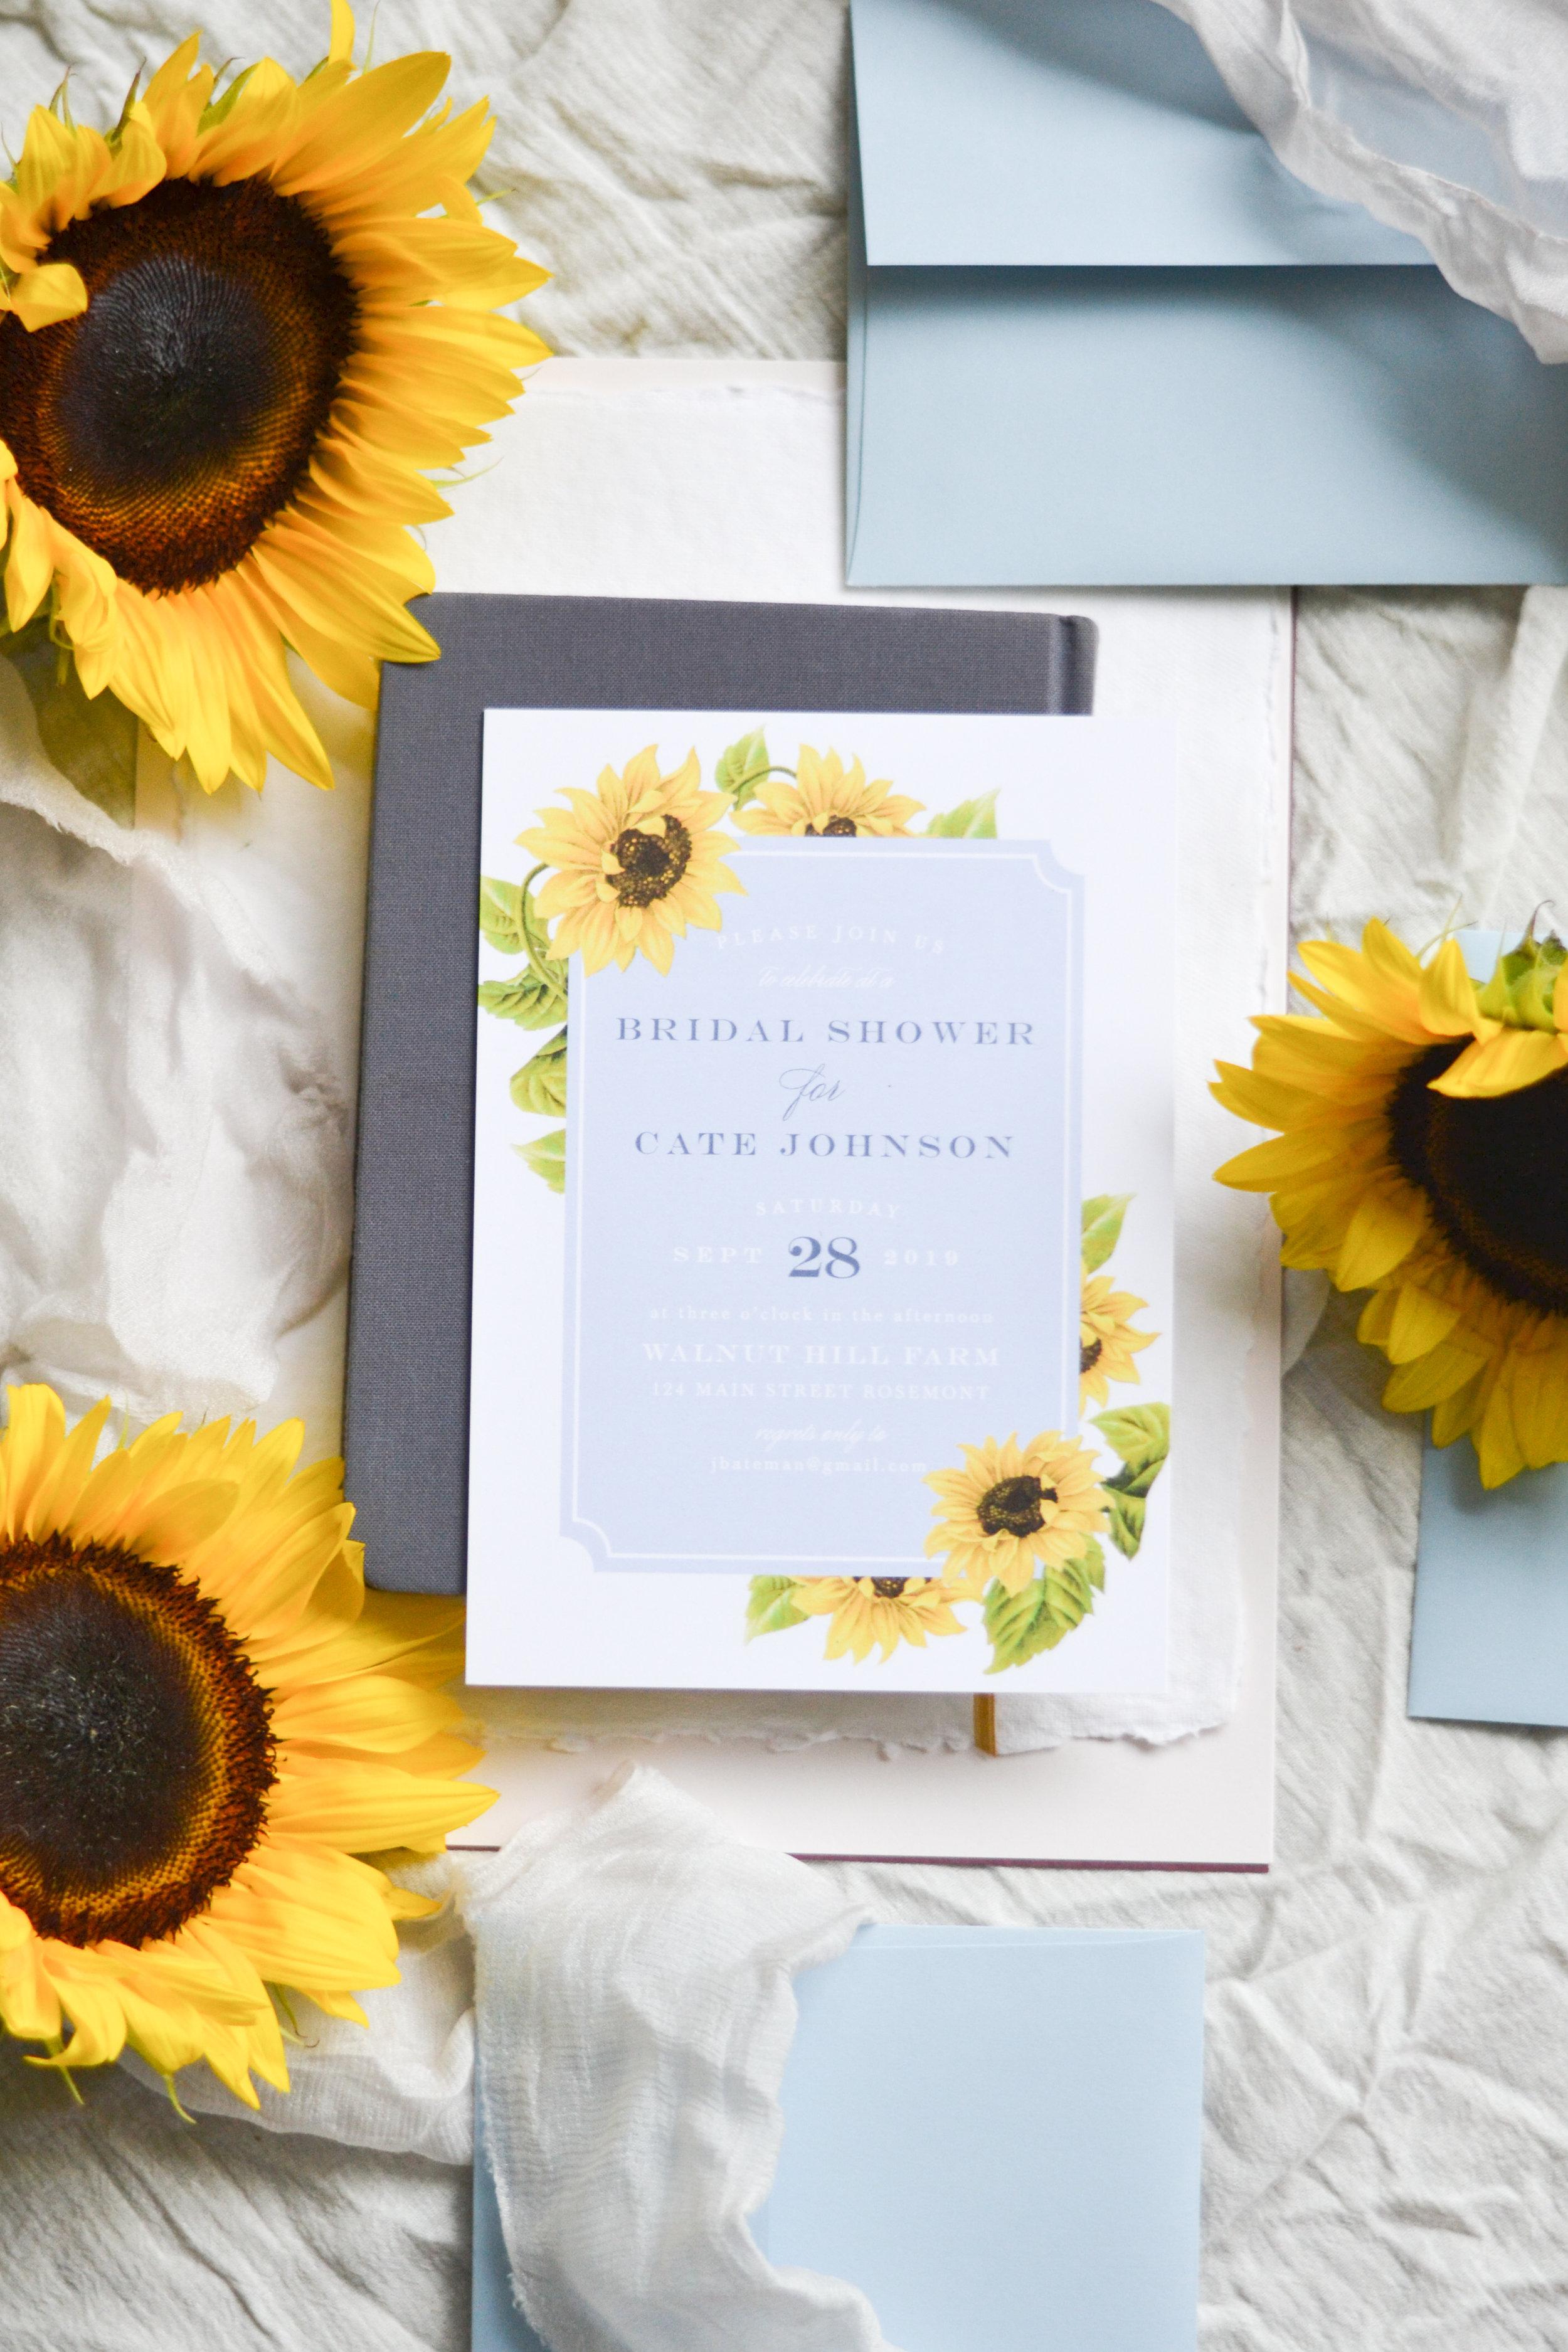 ATaylorStudio - Sunflower Bridal Shower Invites-6.jpg